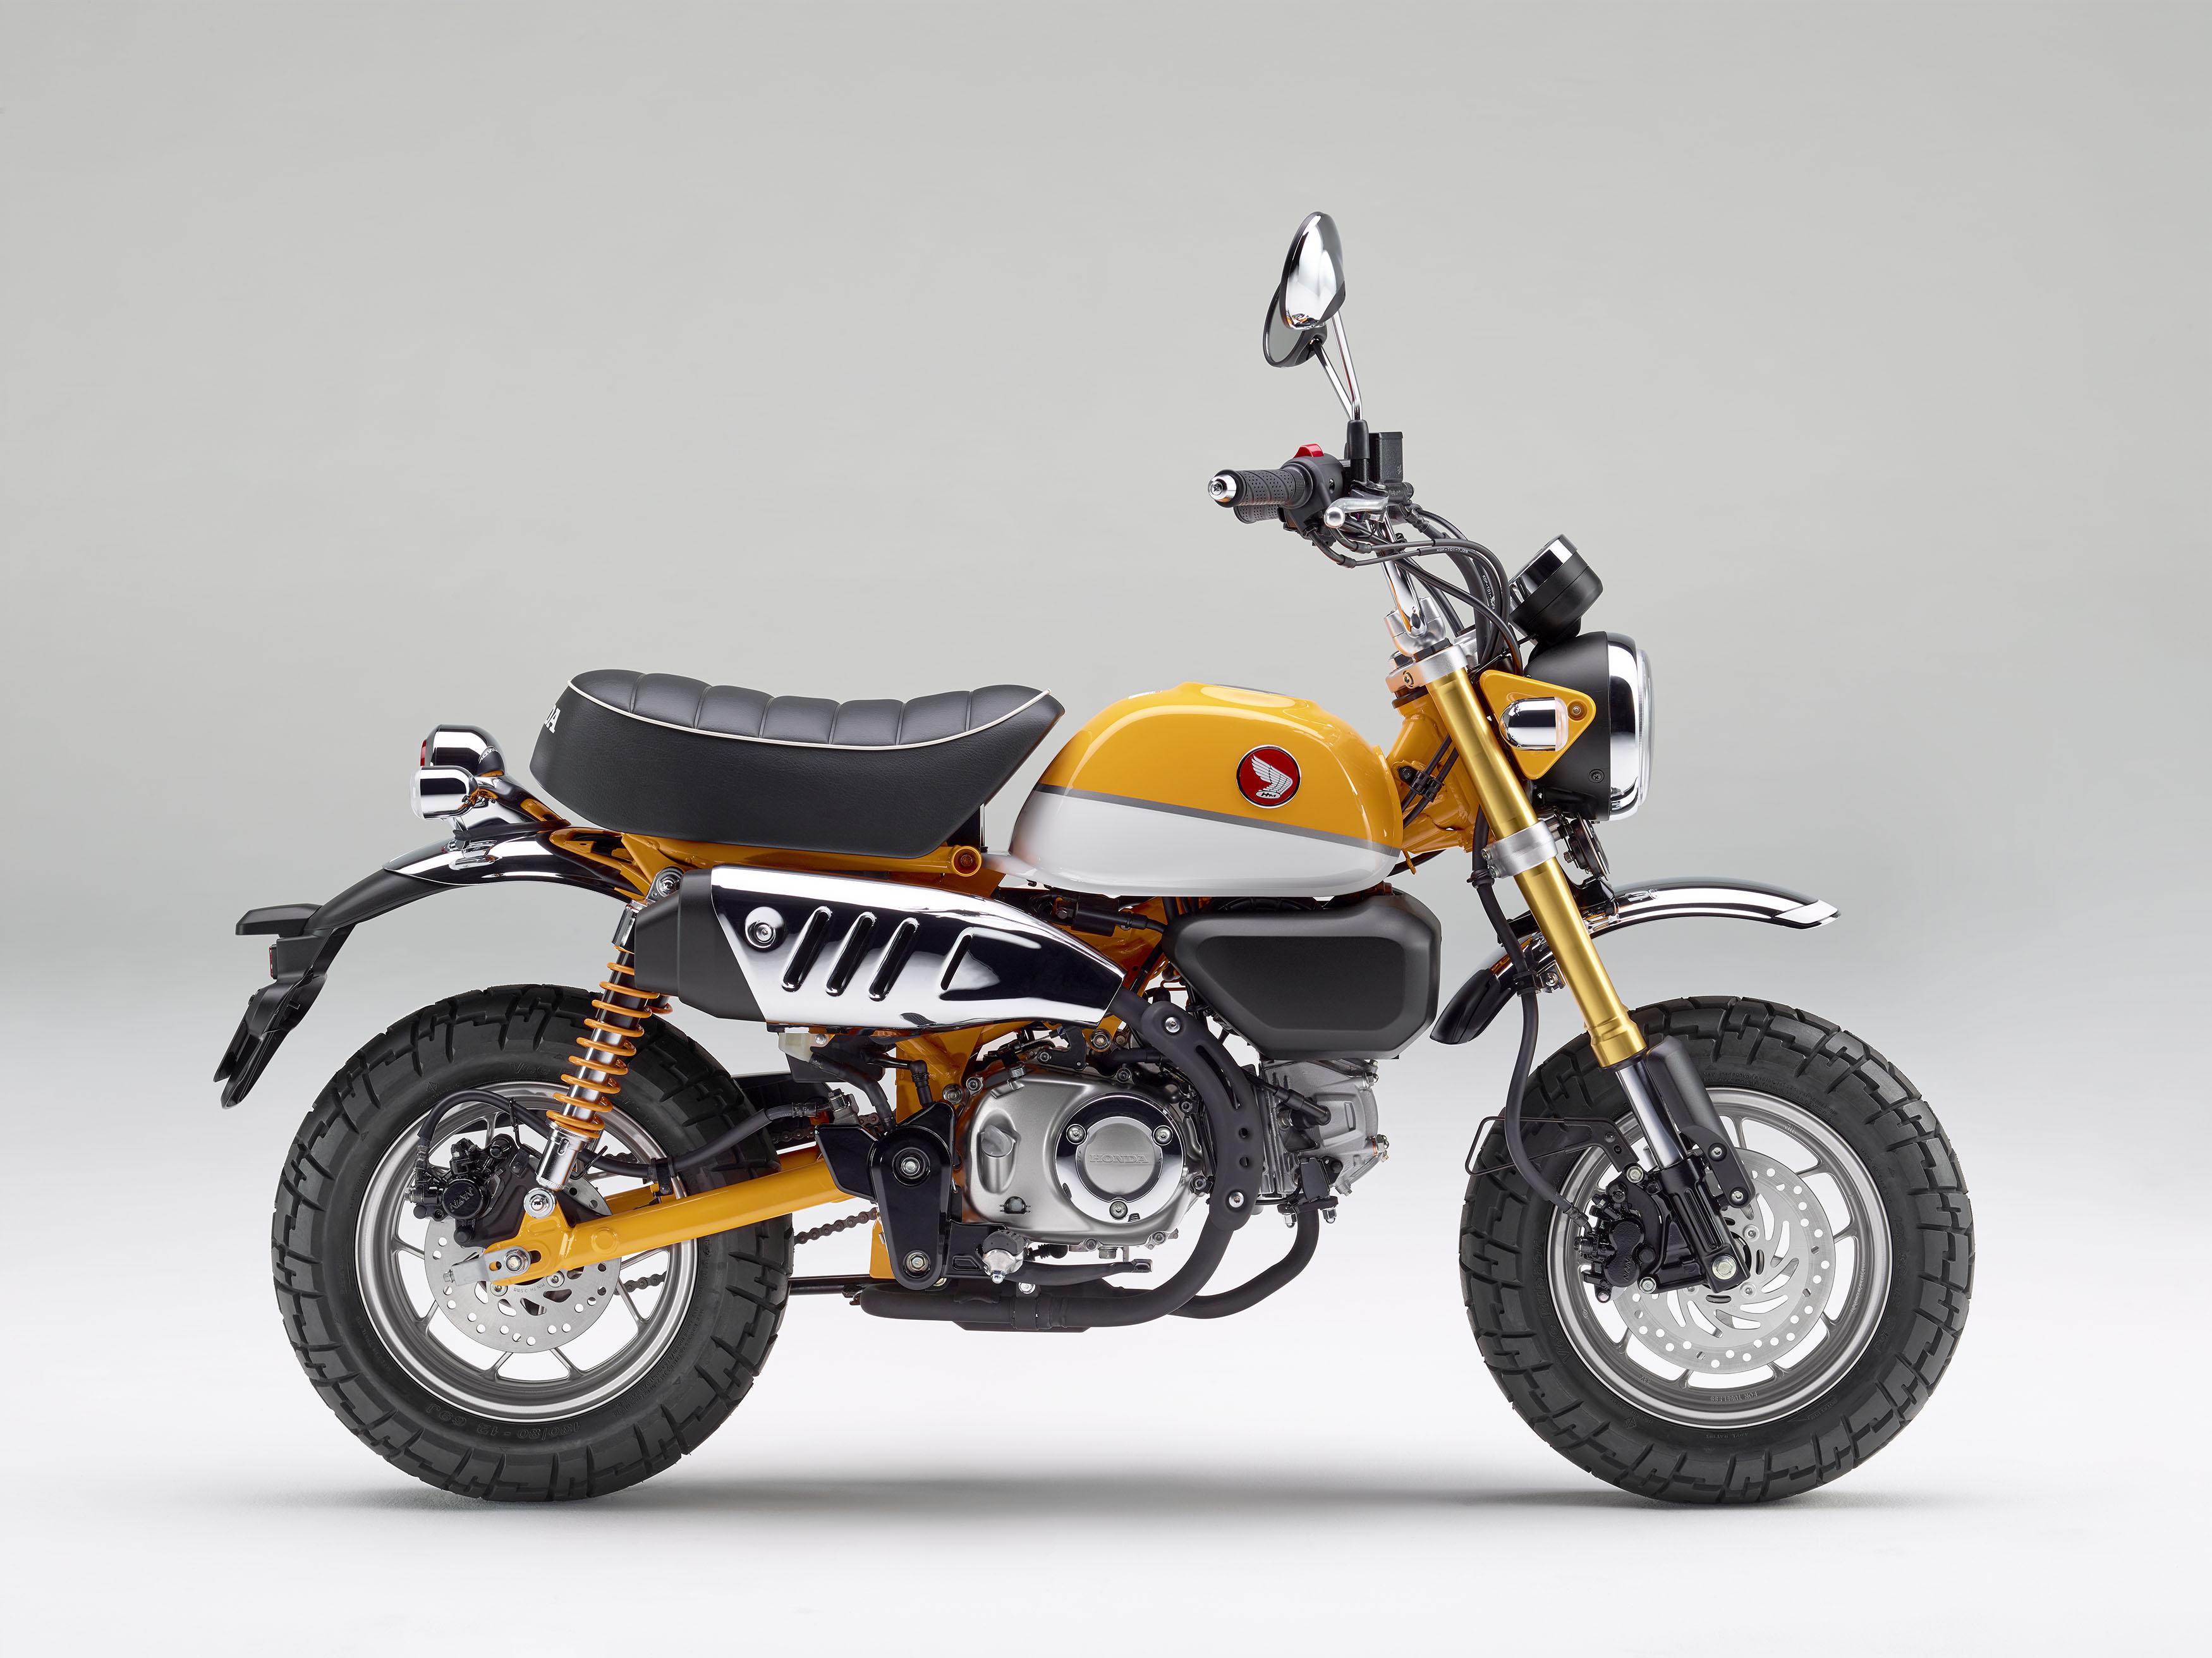 2019 Honda Monkey banana yellow